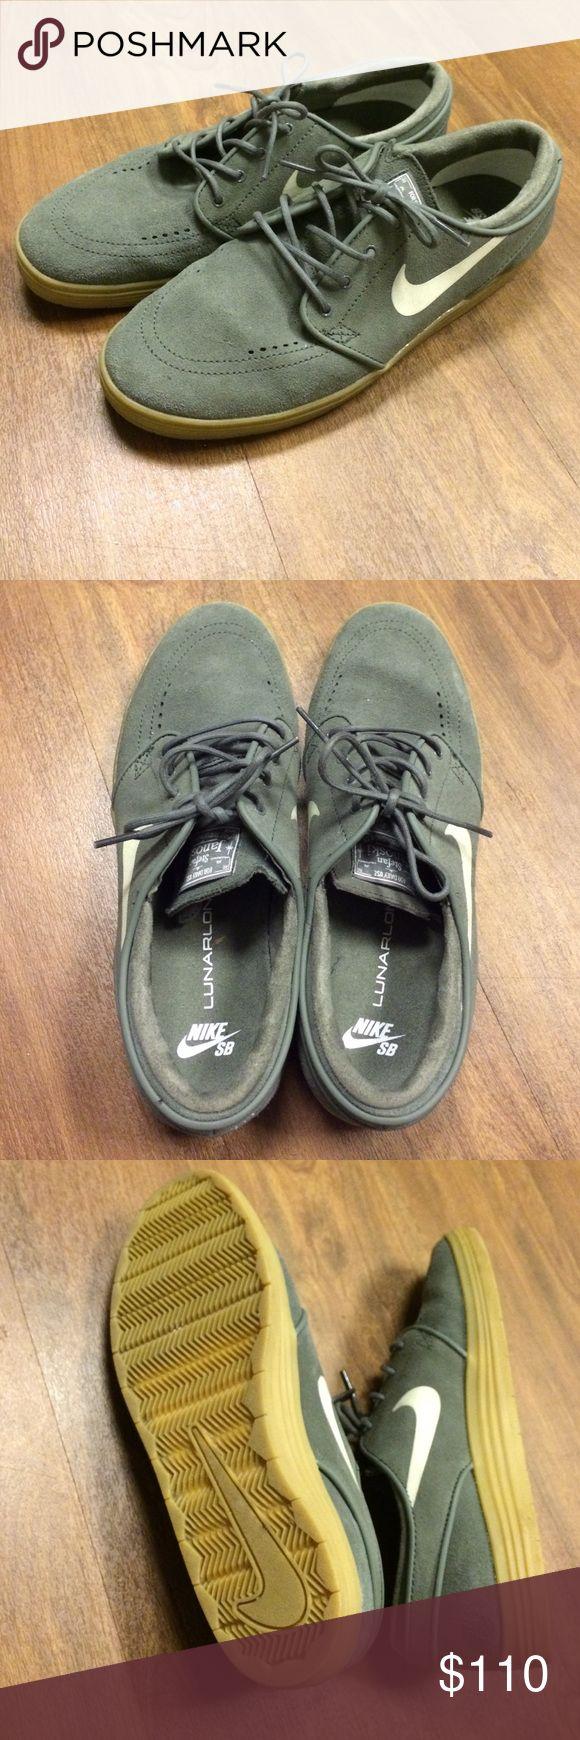 Mens Nike Sneaker Nike Skateboarding Sneaker. Only used once. Looks Brandnew condition! Size 9 for US Mens/ Size 8 for UK Mens. Nike Shoes Sneakers